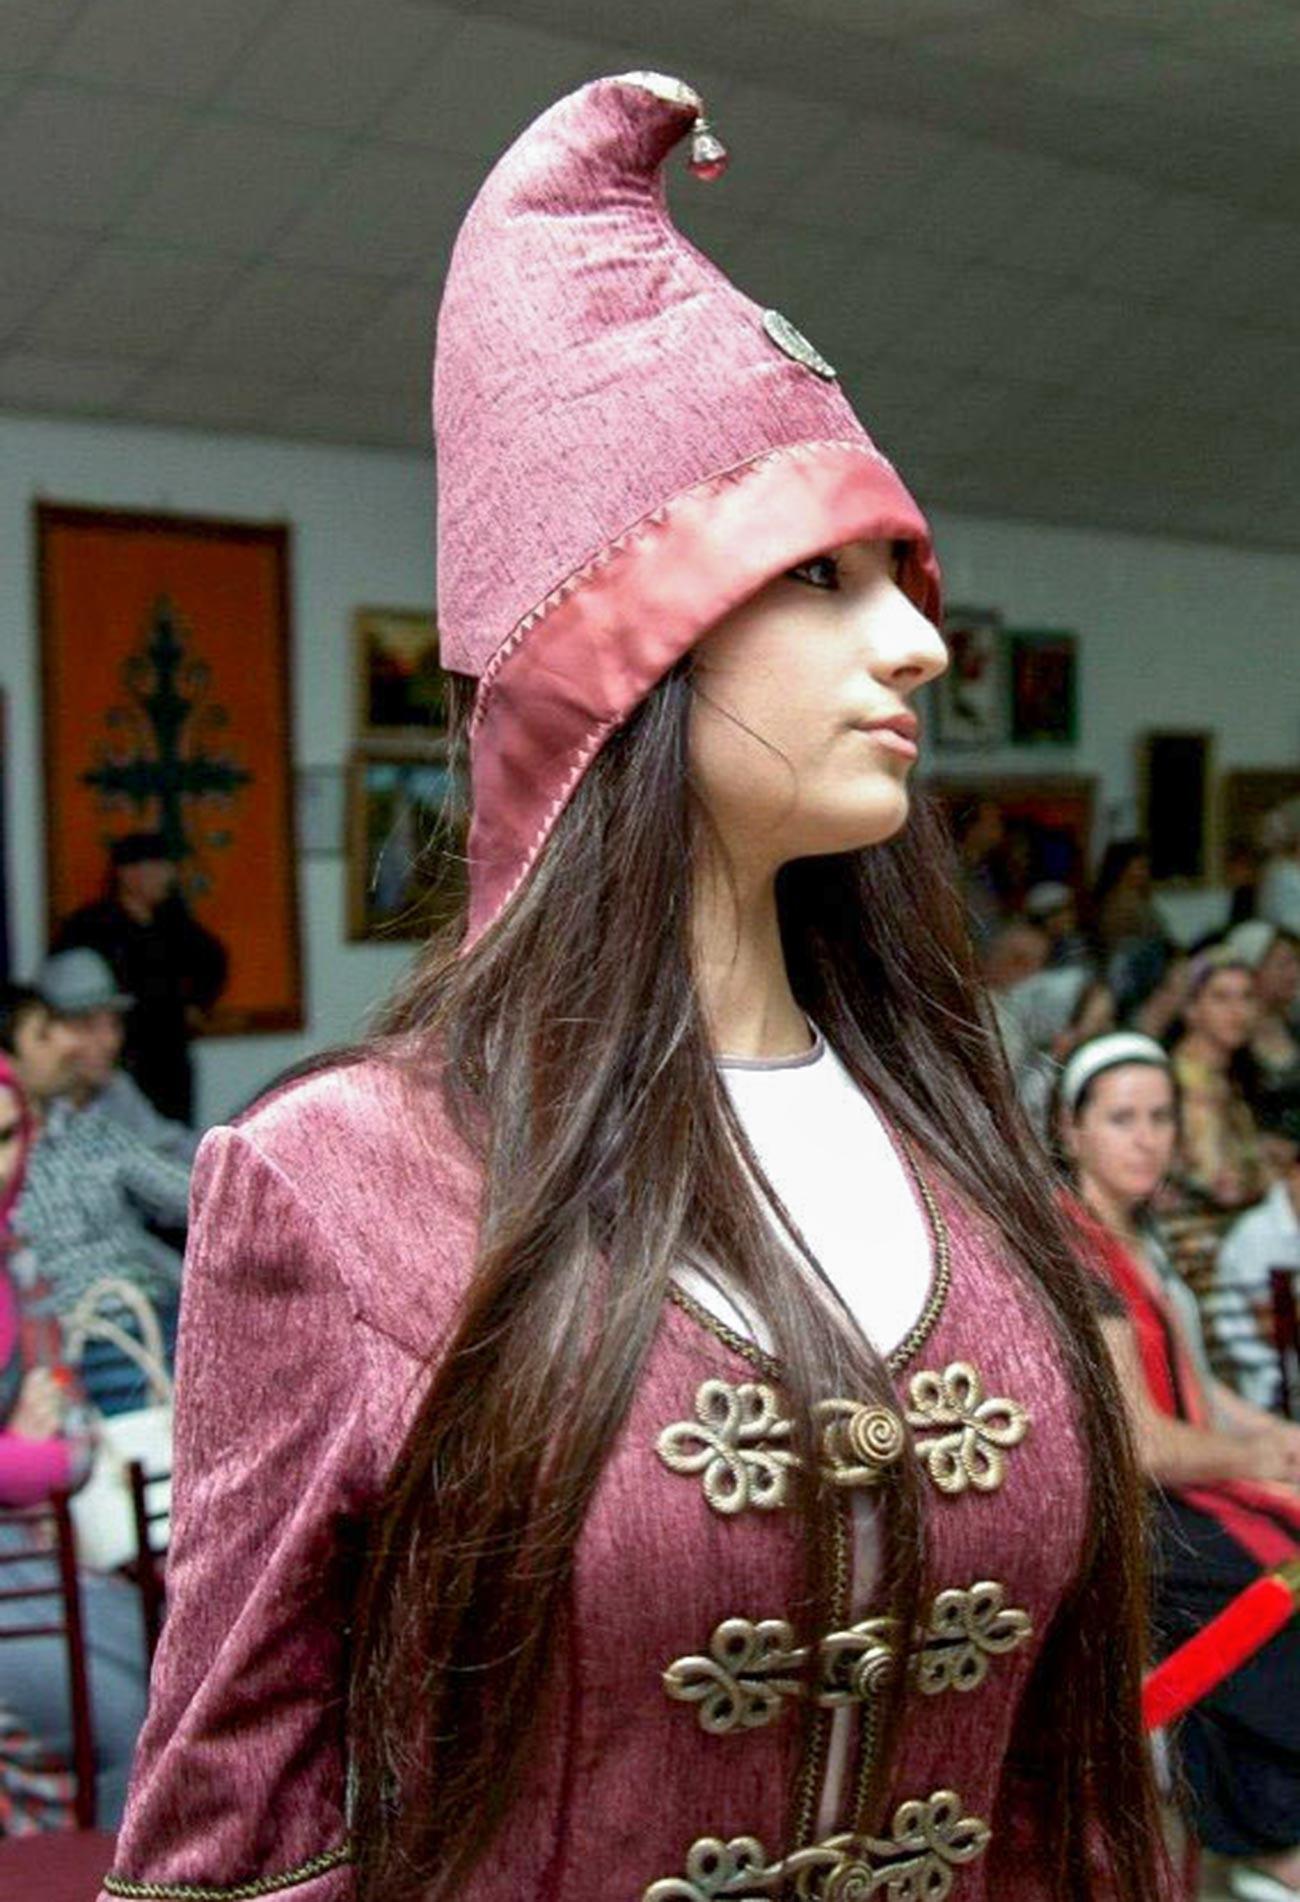 Starodavno žensko pokrivalo - kurhars.